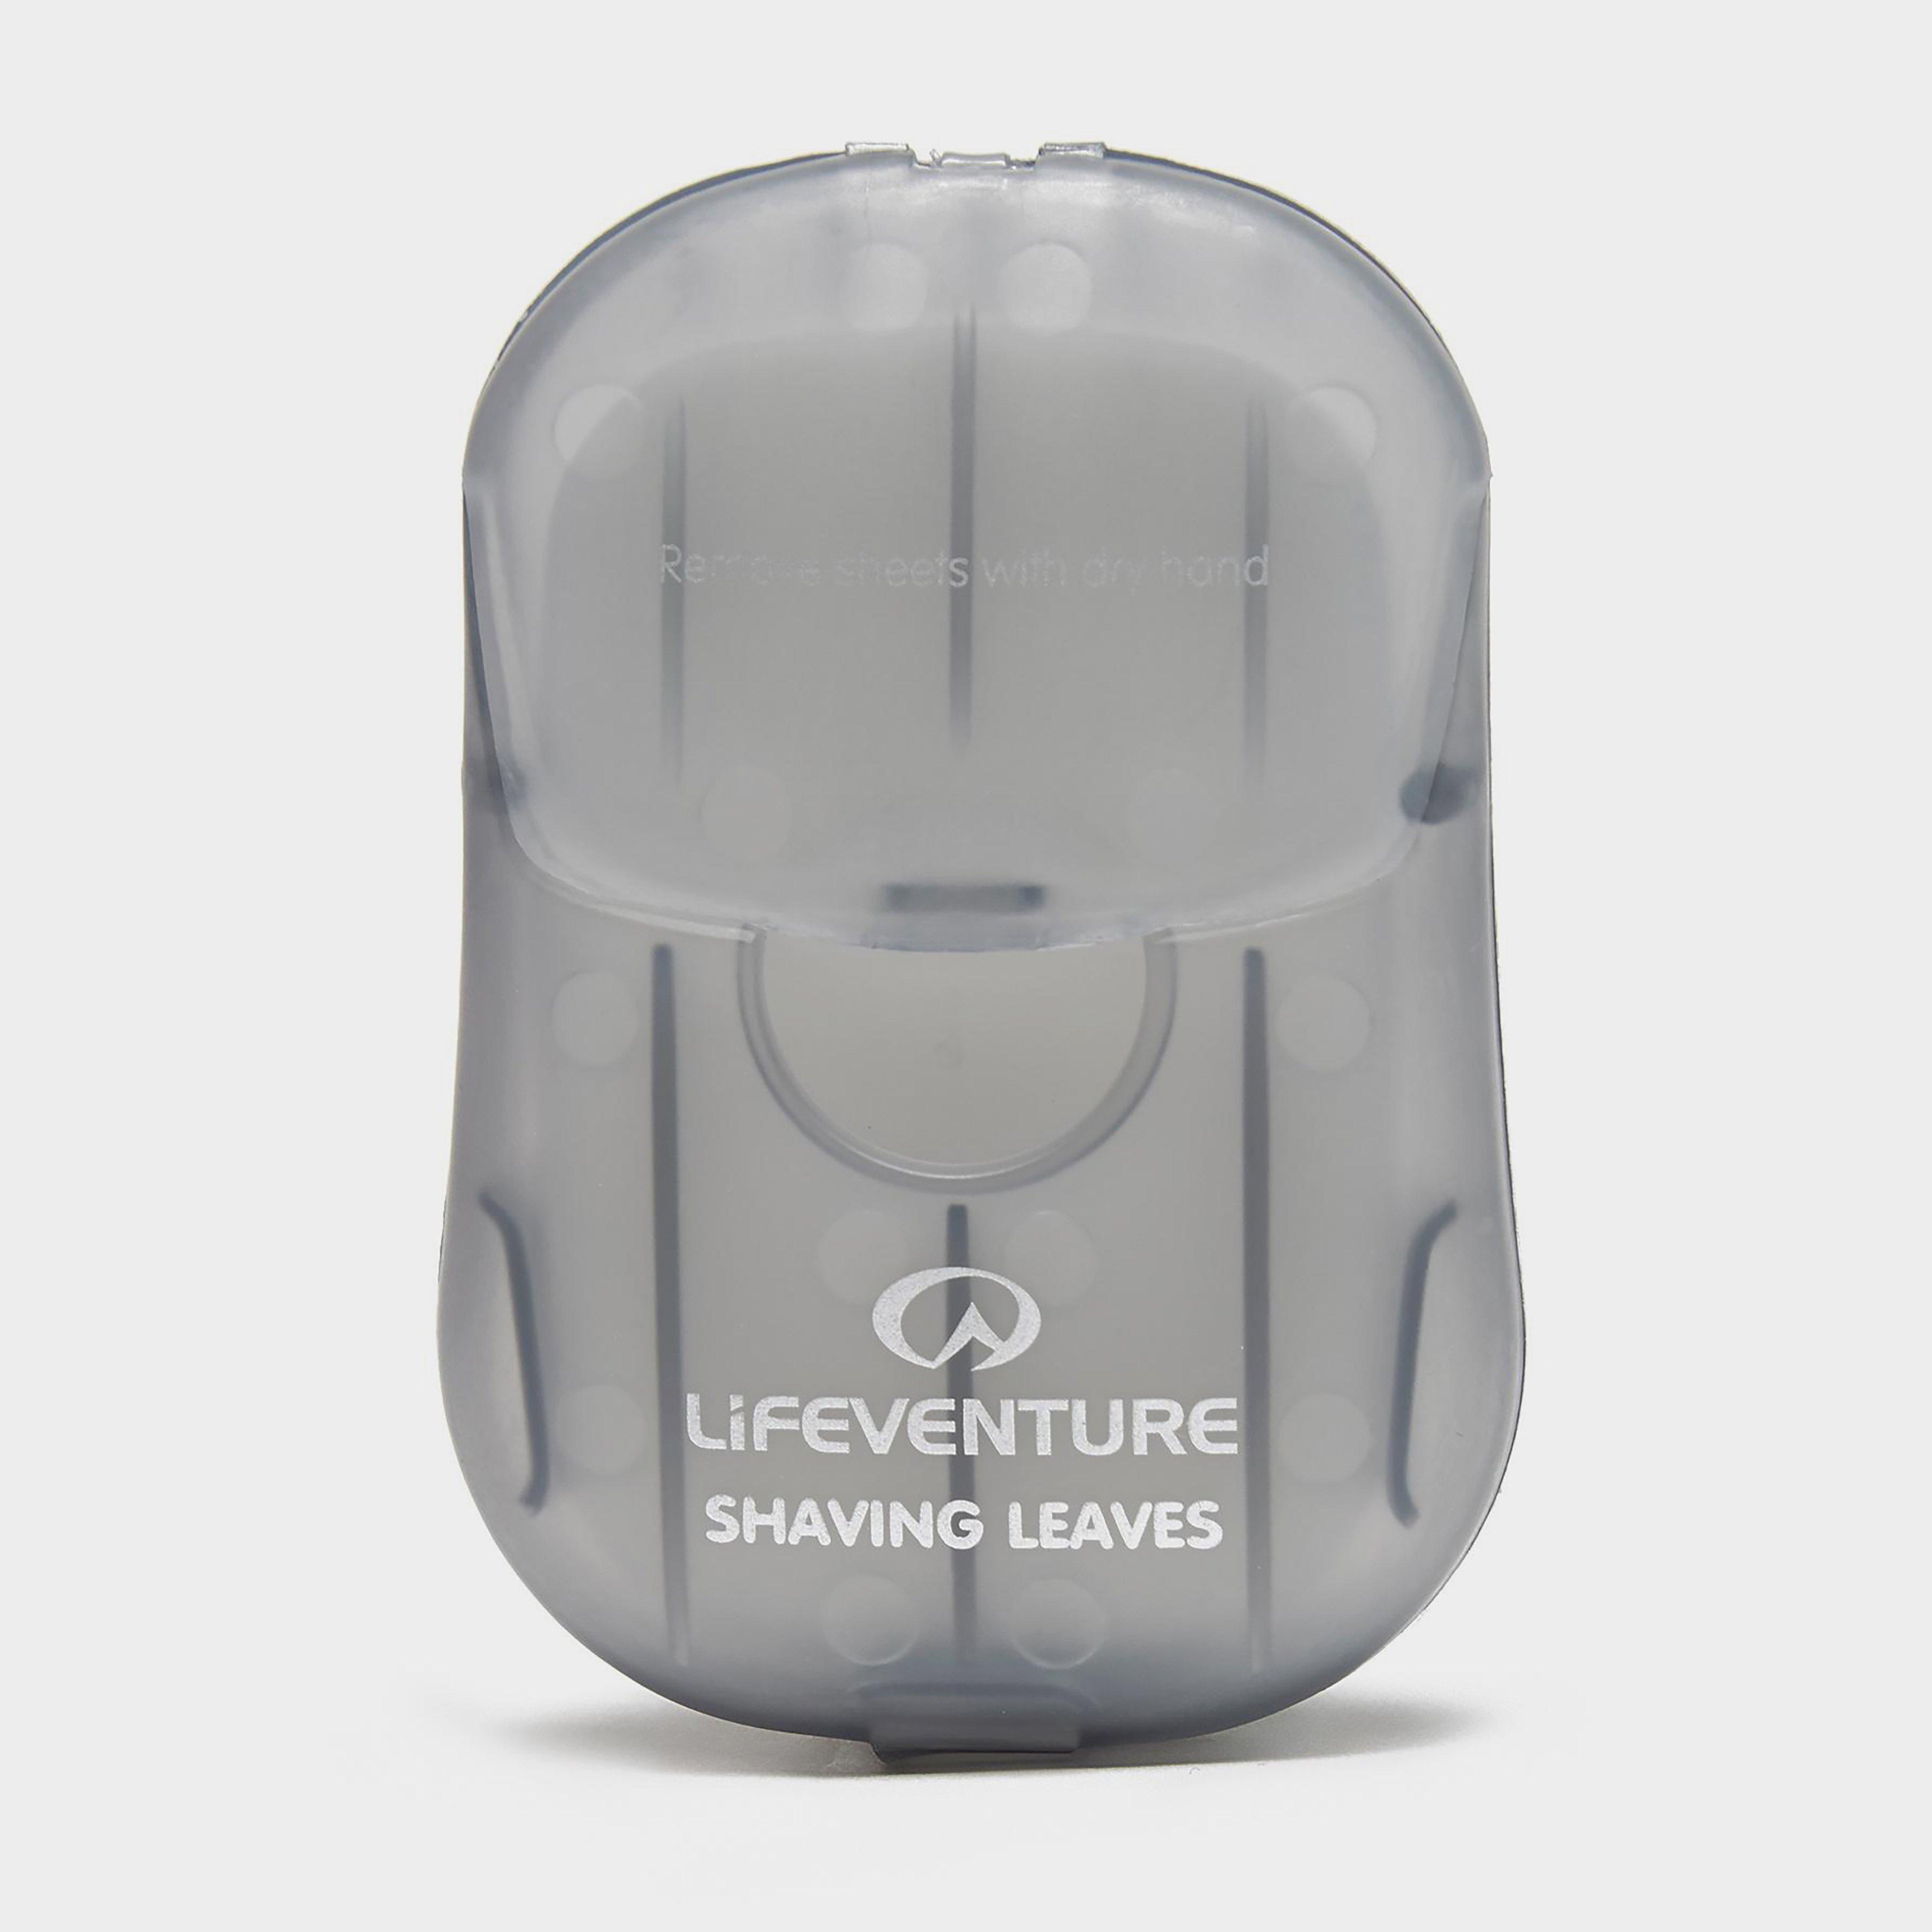 Lifeventure Lifeventure Shaving Leaves - N/A, N/A